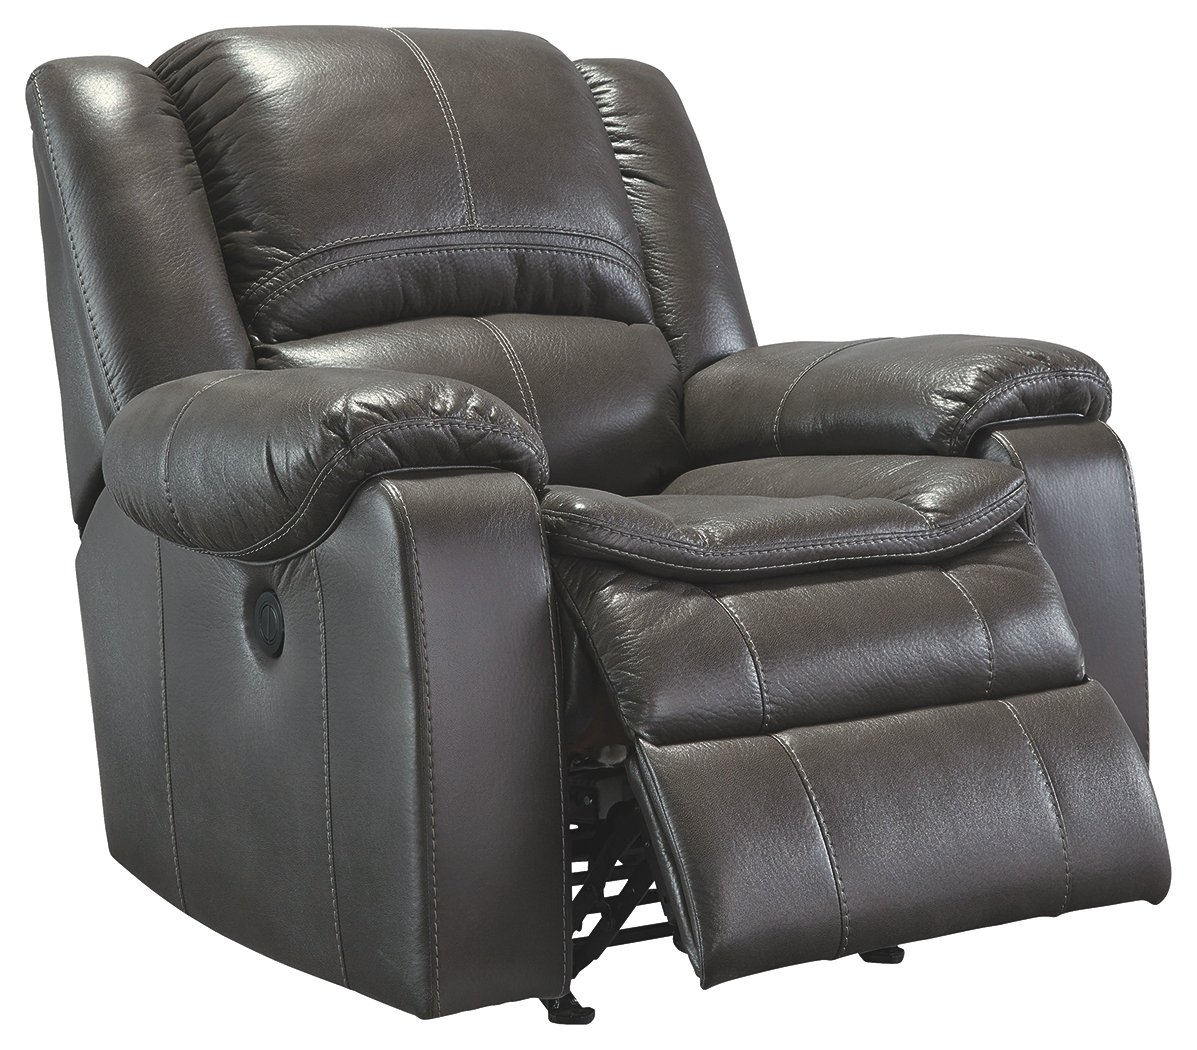 Superbe Amazon.com: Ashley Furniture Signature Design   Long Knight Recliner   Power  Reclining Chair   Gray: Kitchen U0026 Dining